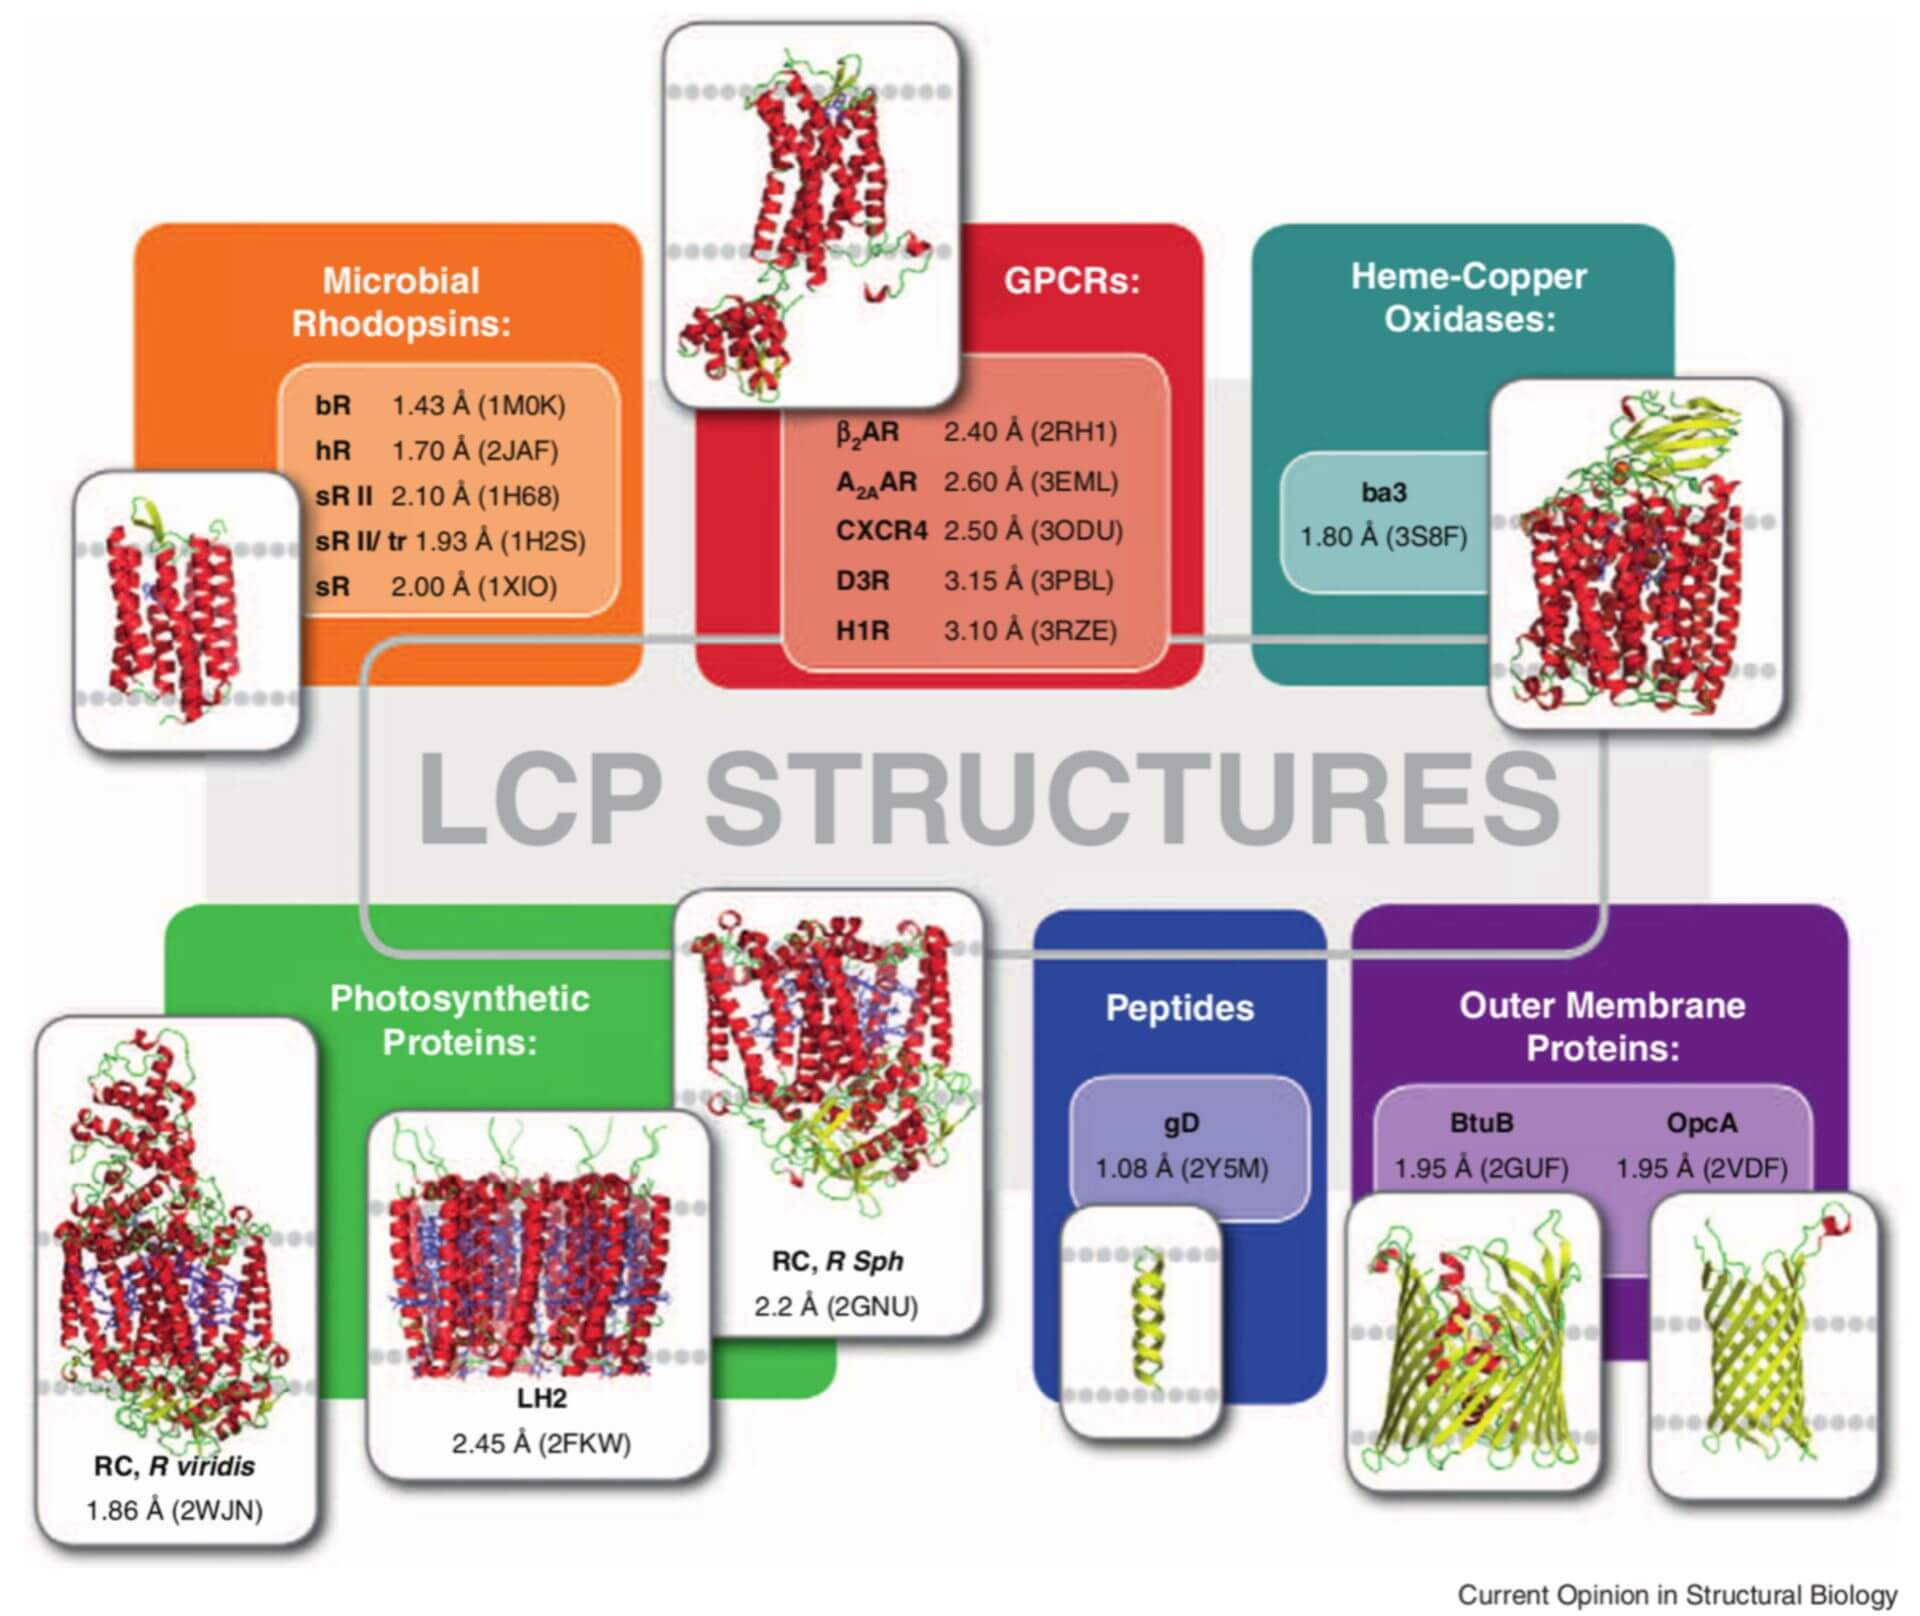 lipidic cubic phase crystallization